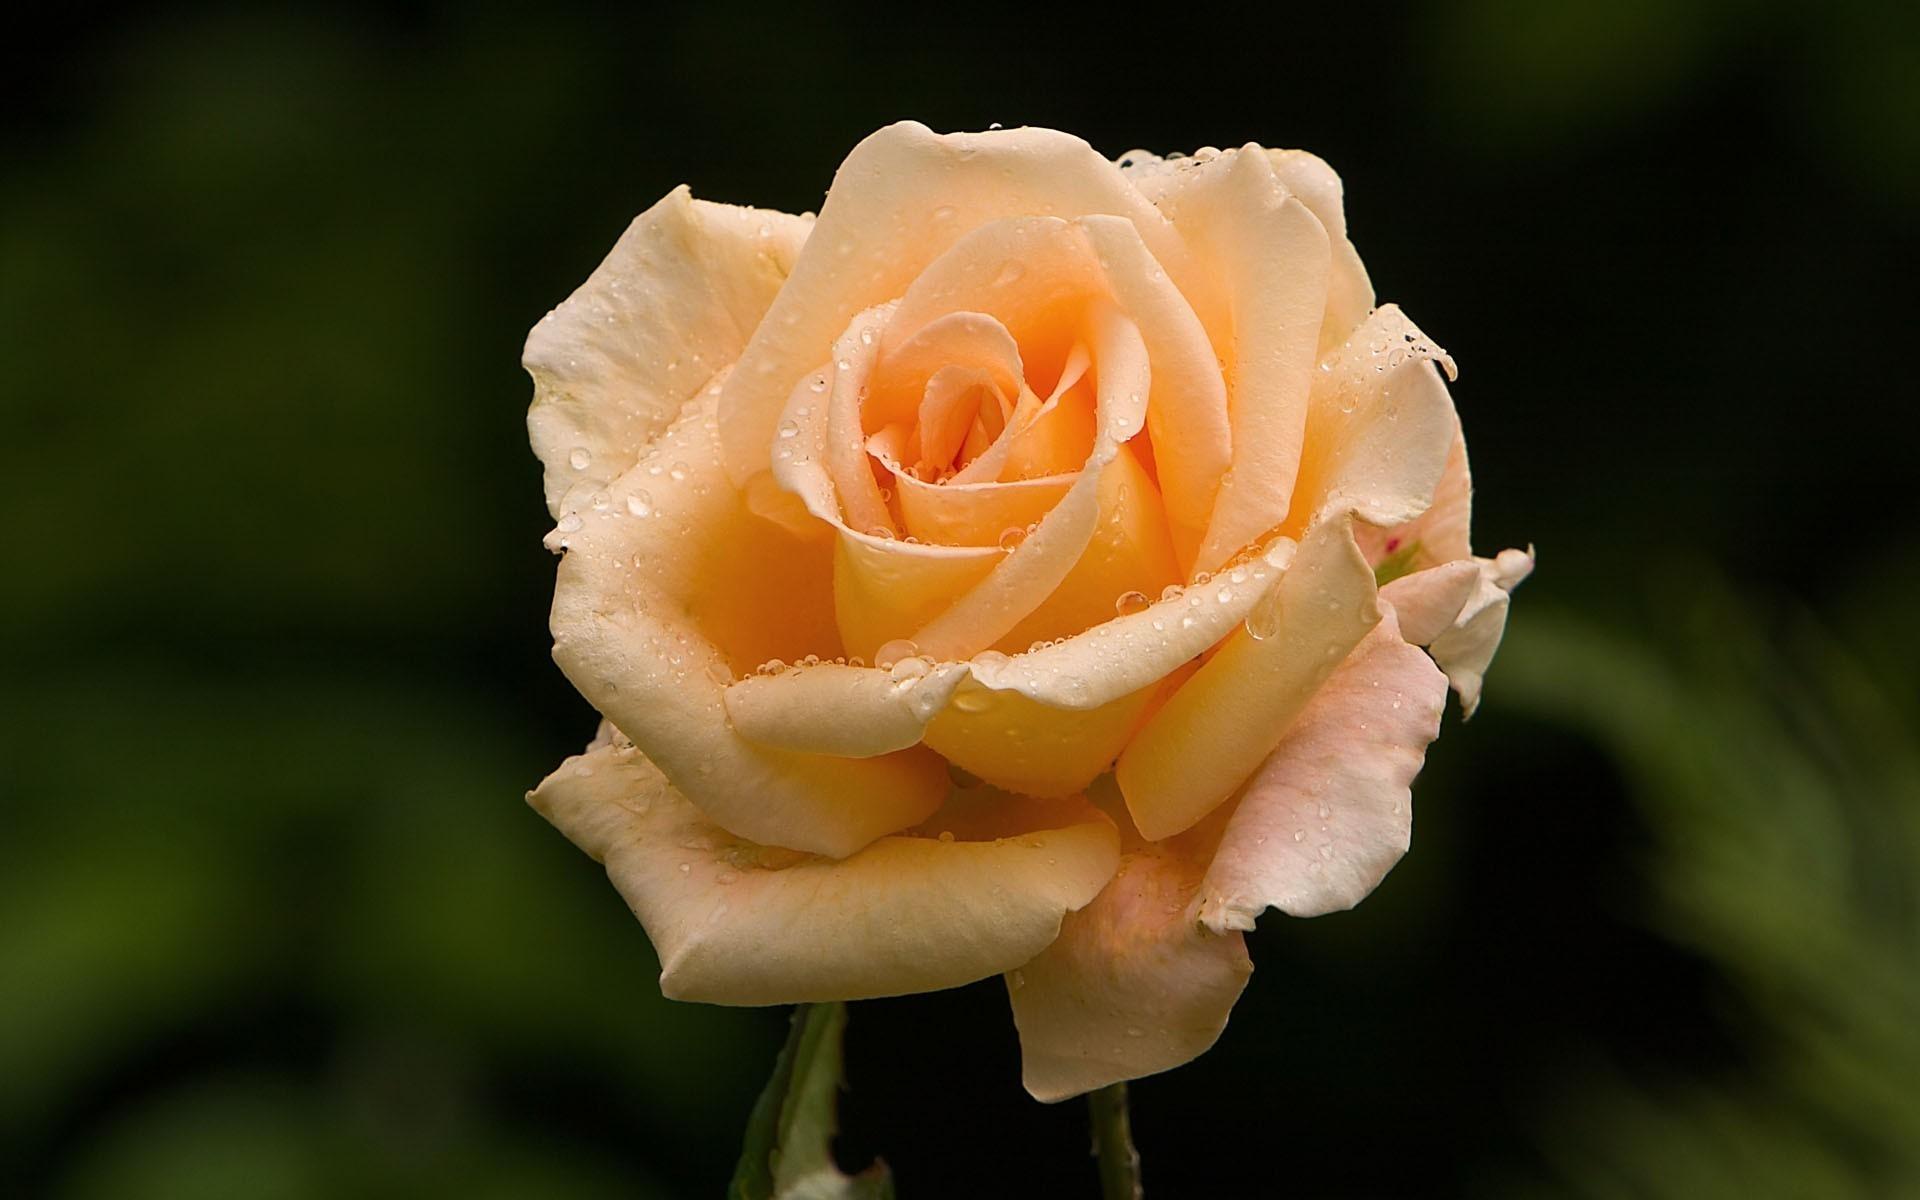 https://get.wallhere.com/photo/yellow-rose-Peach-spring-light-flower-plant-flora-bud-petal-tender-wildflower-computer-wallpaper-flowering-plant-close-up-macro-photography-plant-stem-garden-roses-rose-family-rose-order-floribunda-rosa-centifolia-china-rose-787461.jpg